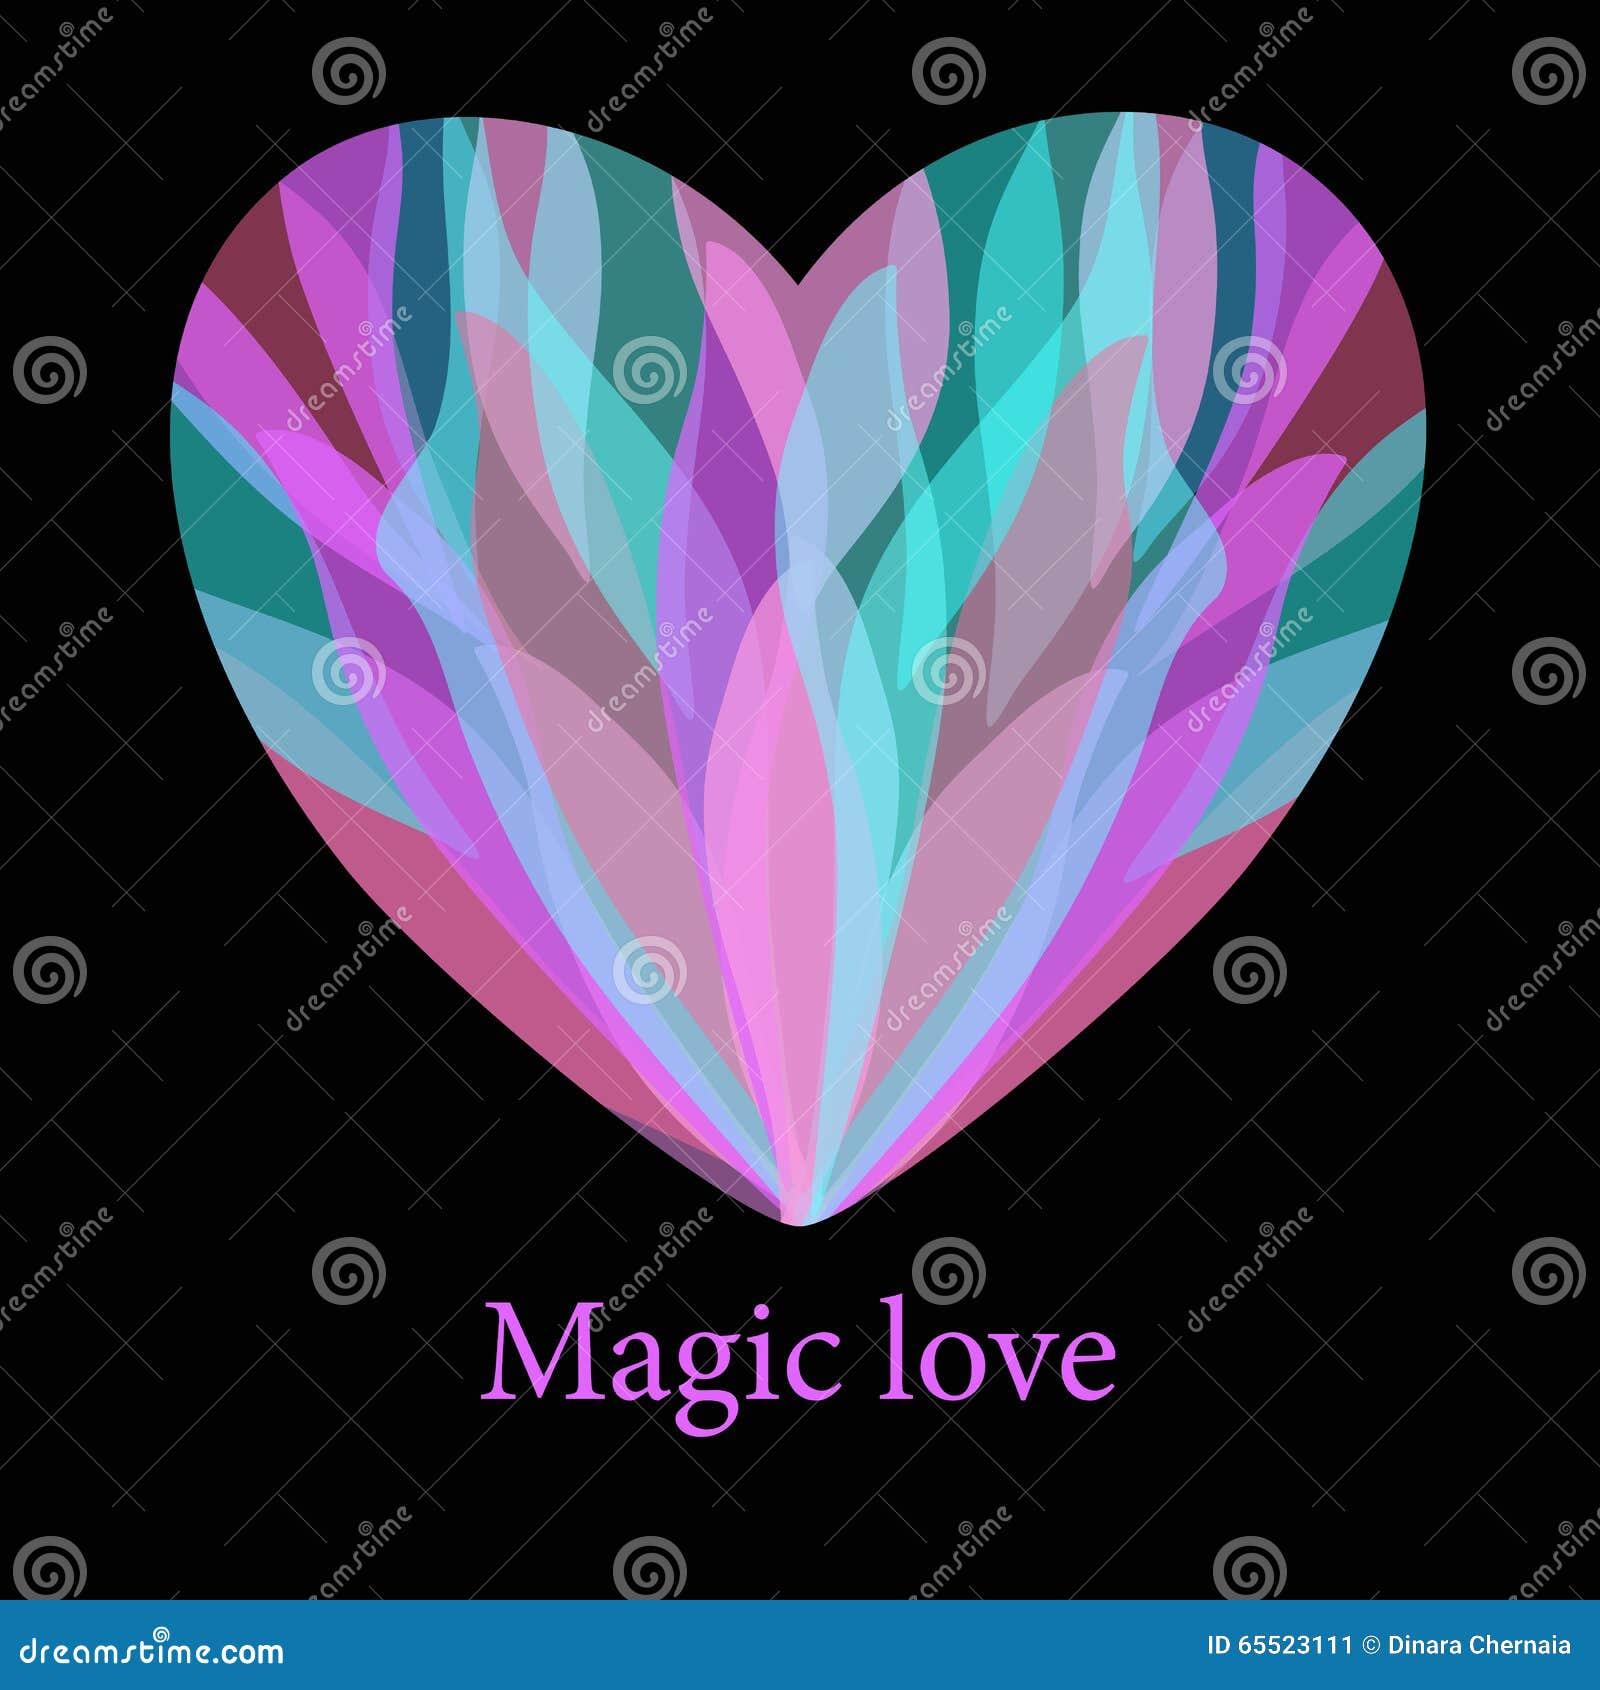 Romantic magic colorful heart with splash background stock vector romantic magic colorful heart with splash background kristyandbryce Images